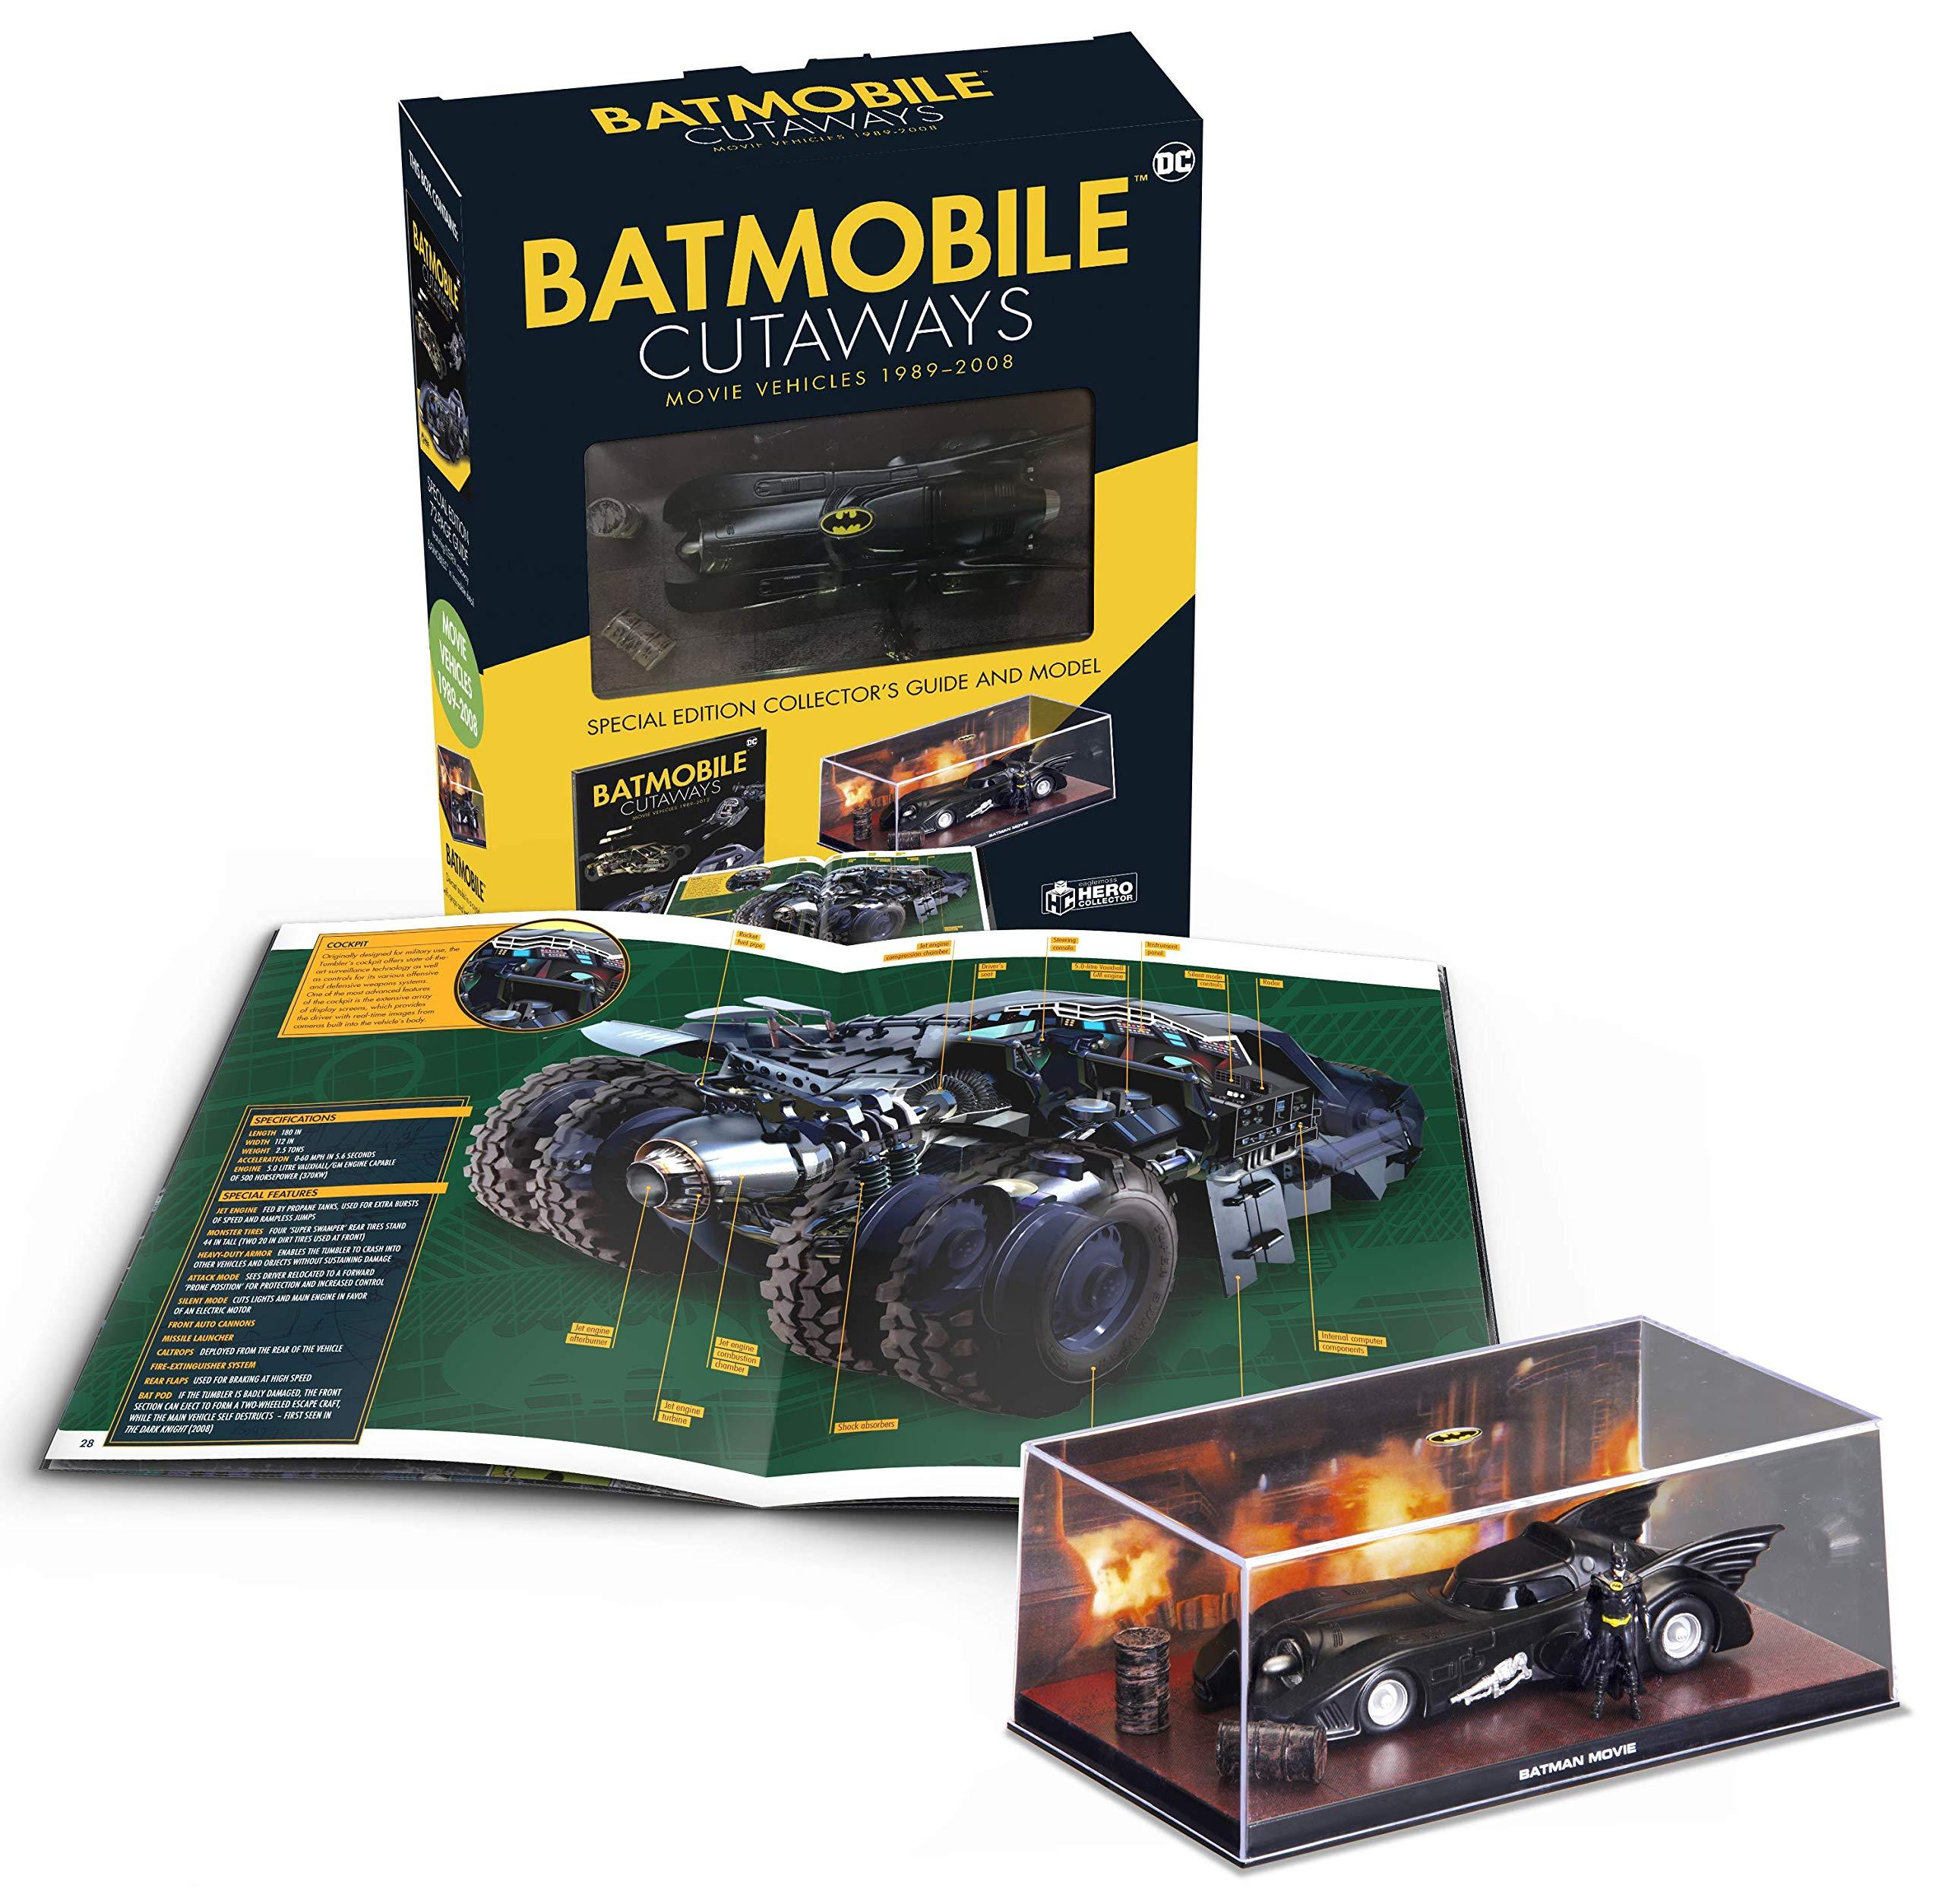 Eaglemoss Hero Collector – Batmobile Cutaways: The Movie VehiclesBoxed Set